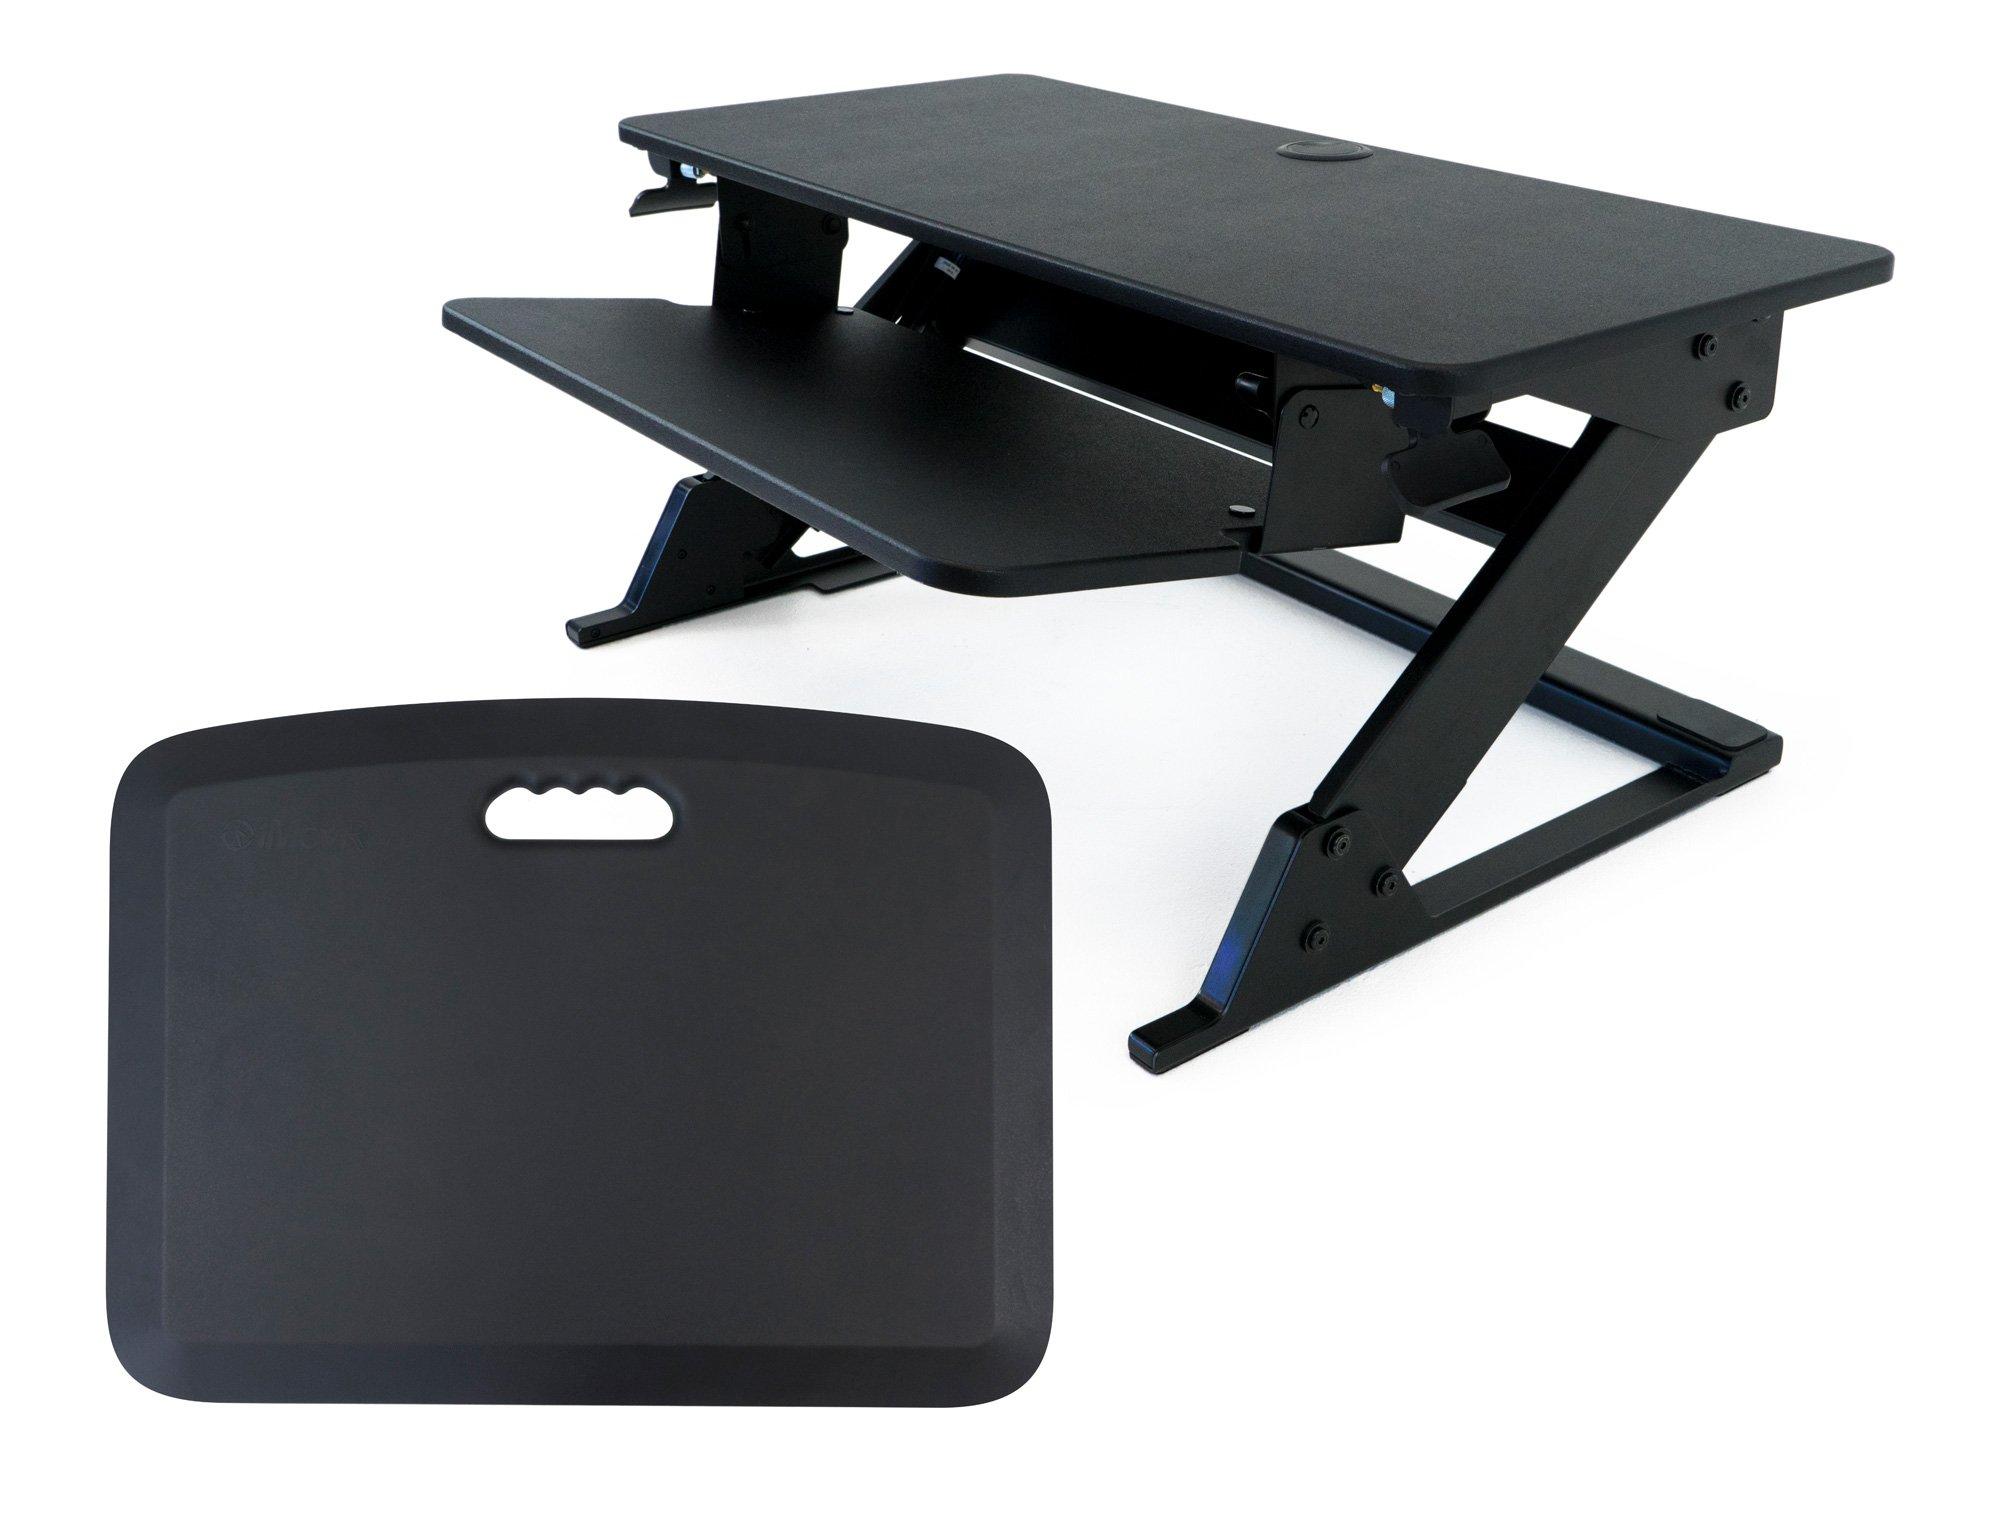 iMovR ZipLift Plus Standing Desk Converter with Ergonomic Tilting Keyboard Tray